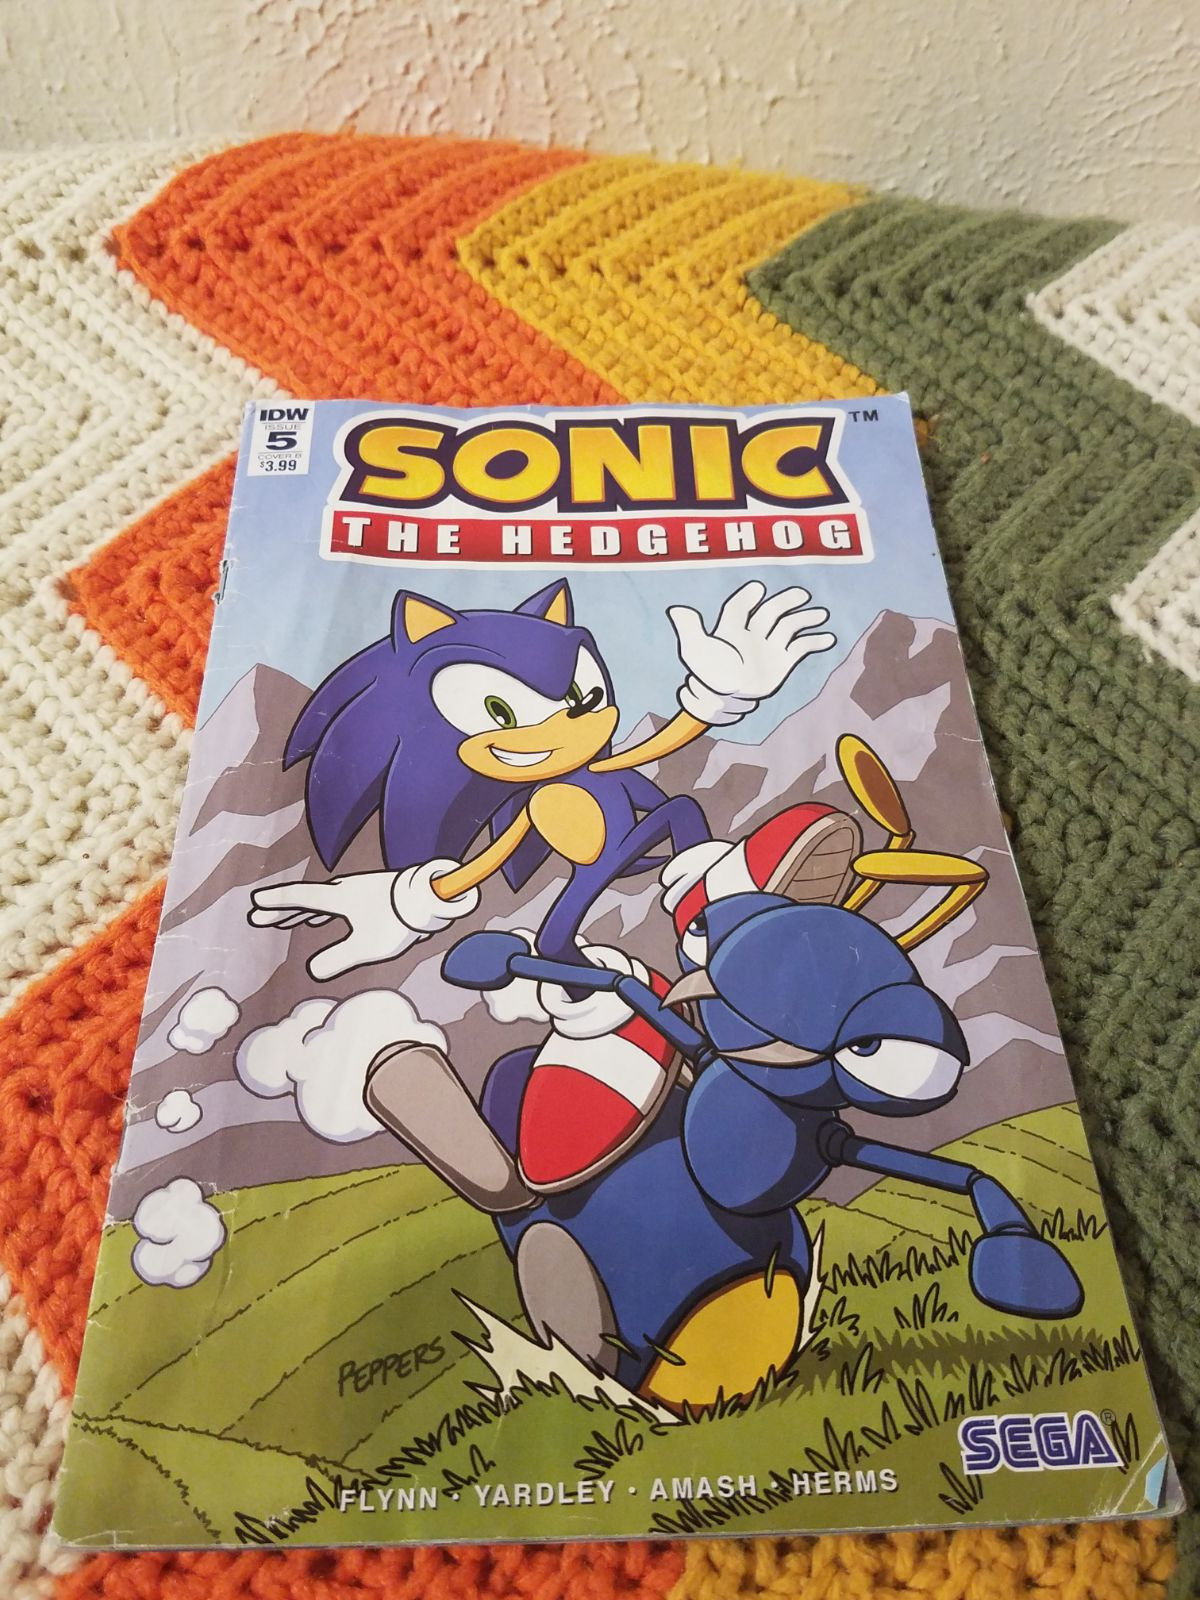 Sonic comic book